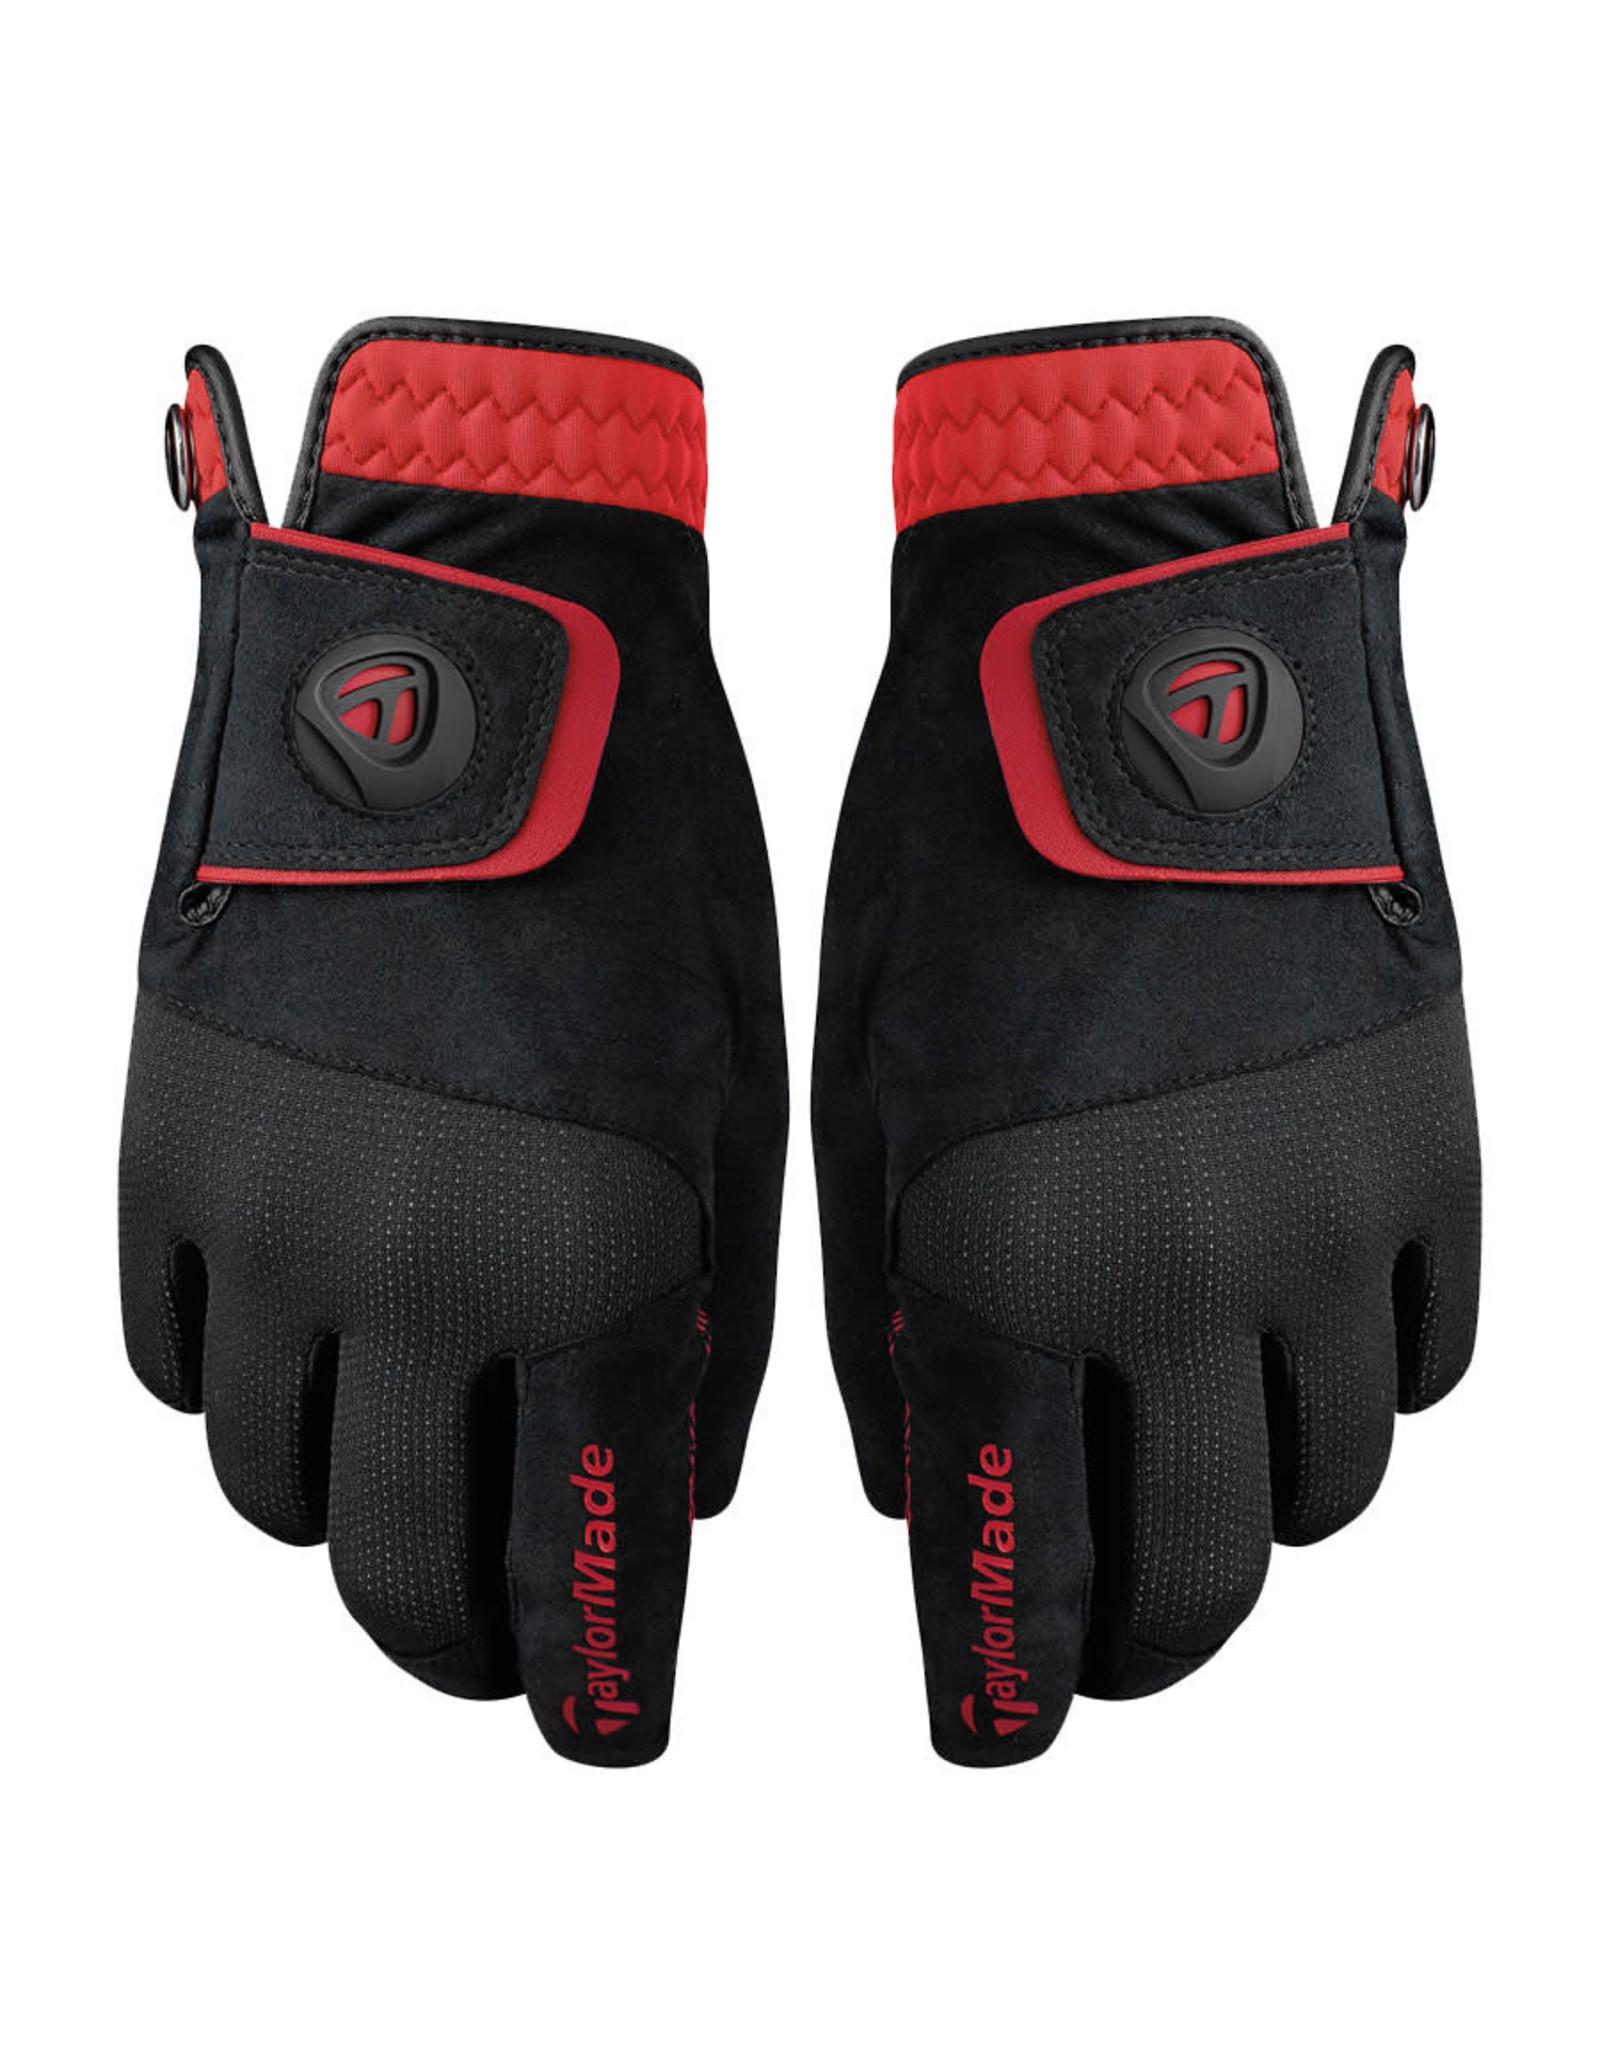 Taylormade Taylormade Rain Control Gloves Black/Reg